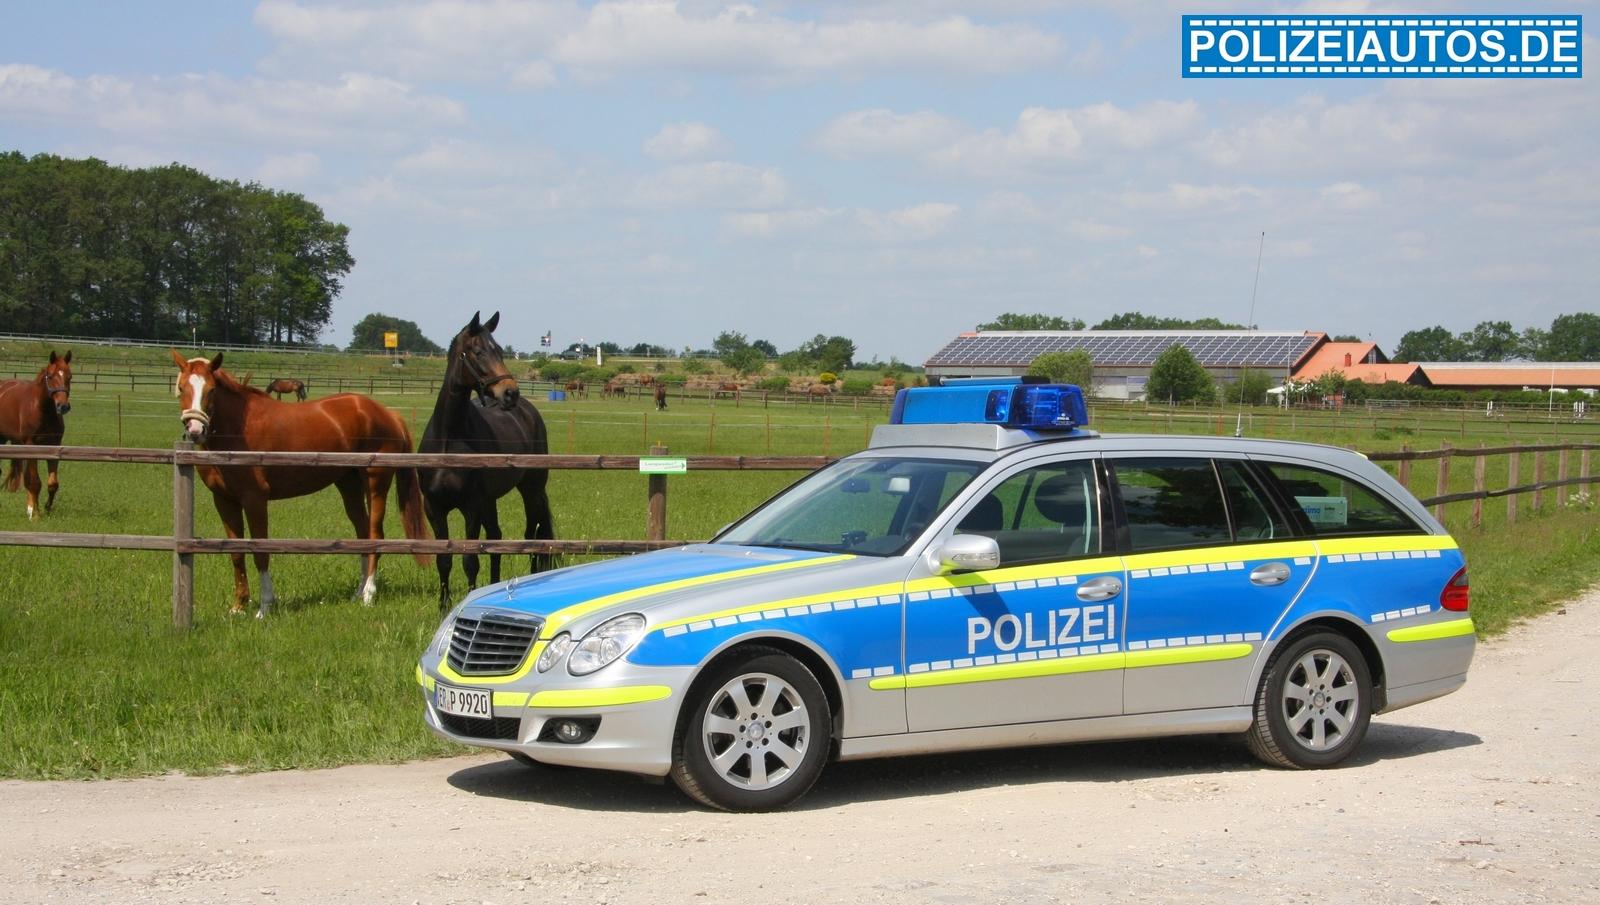 polizeiautosde